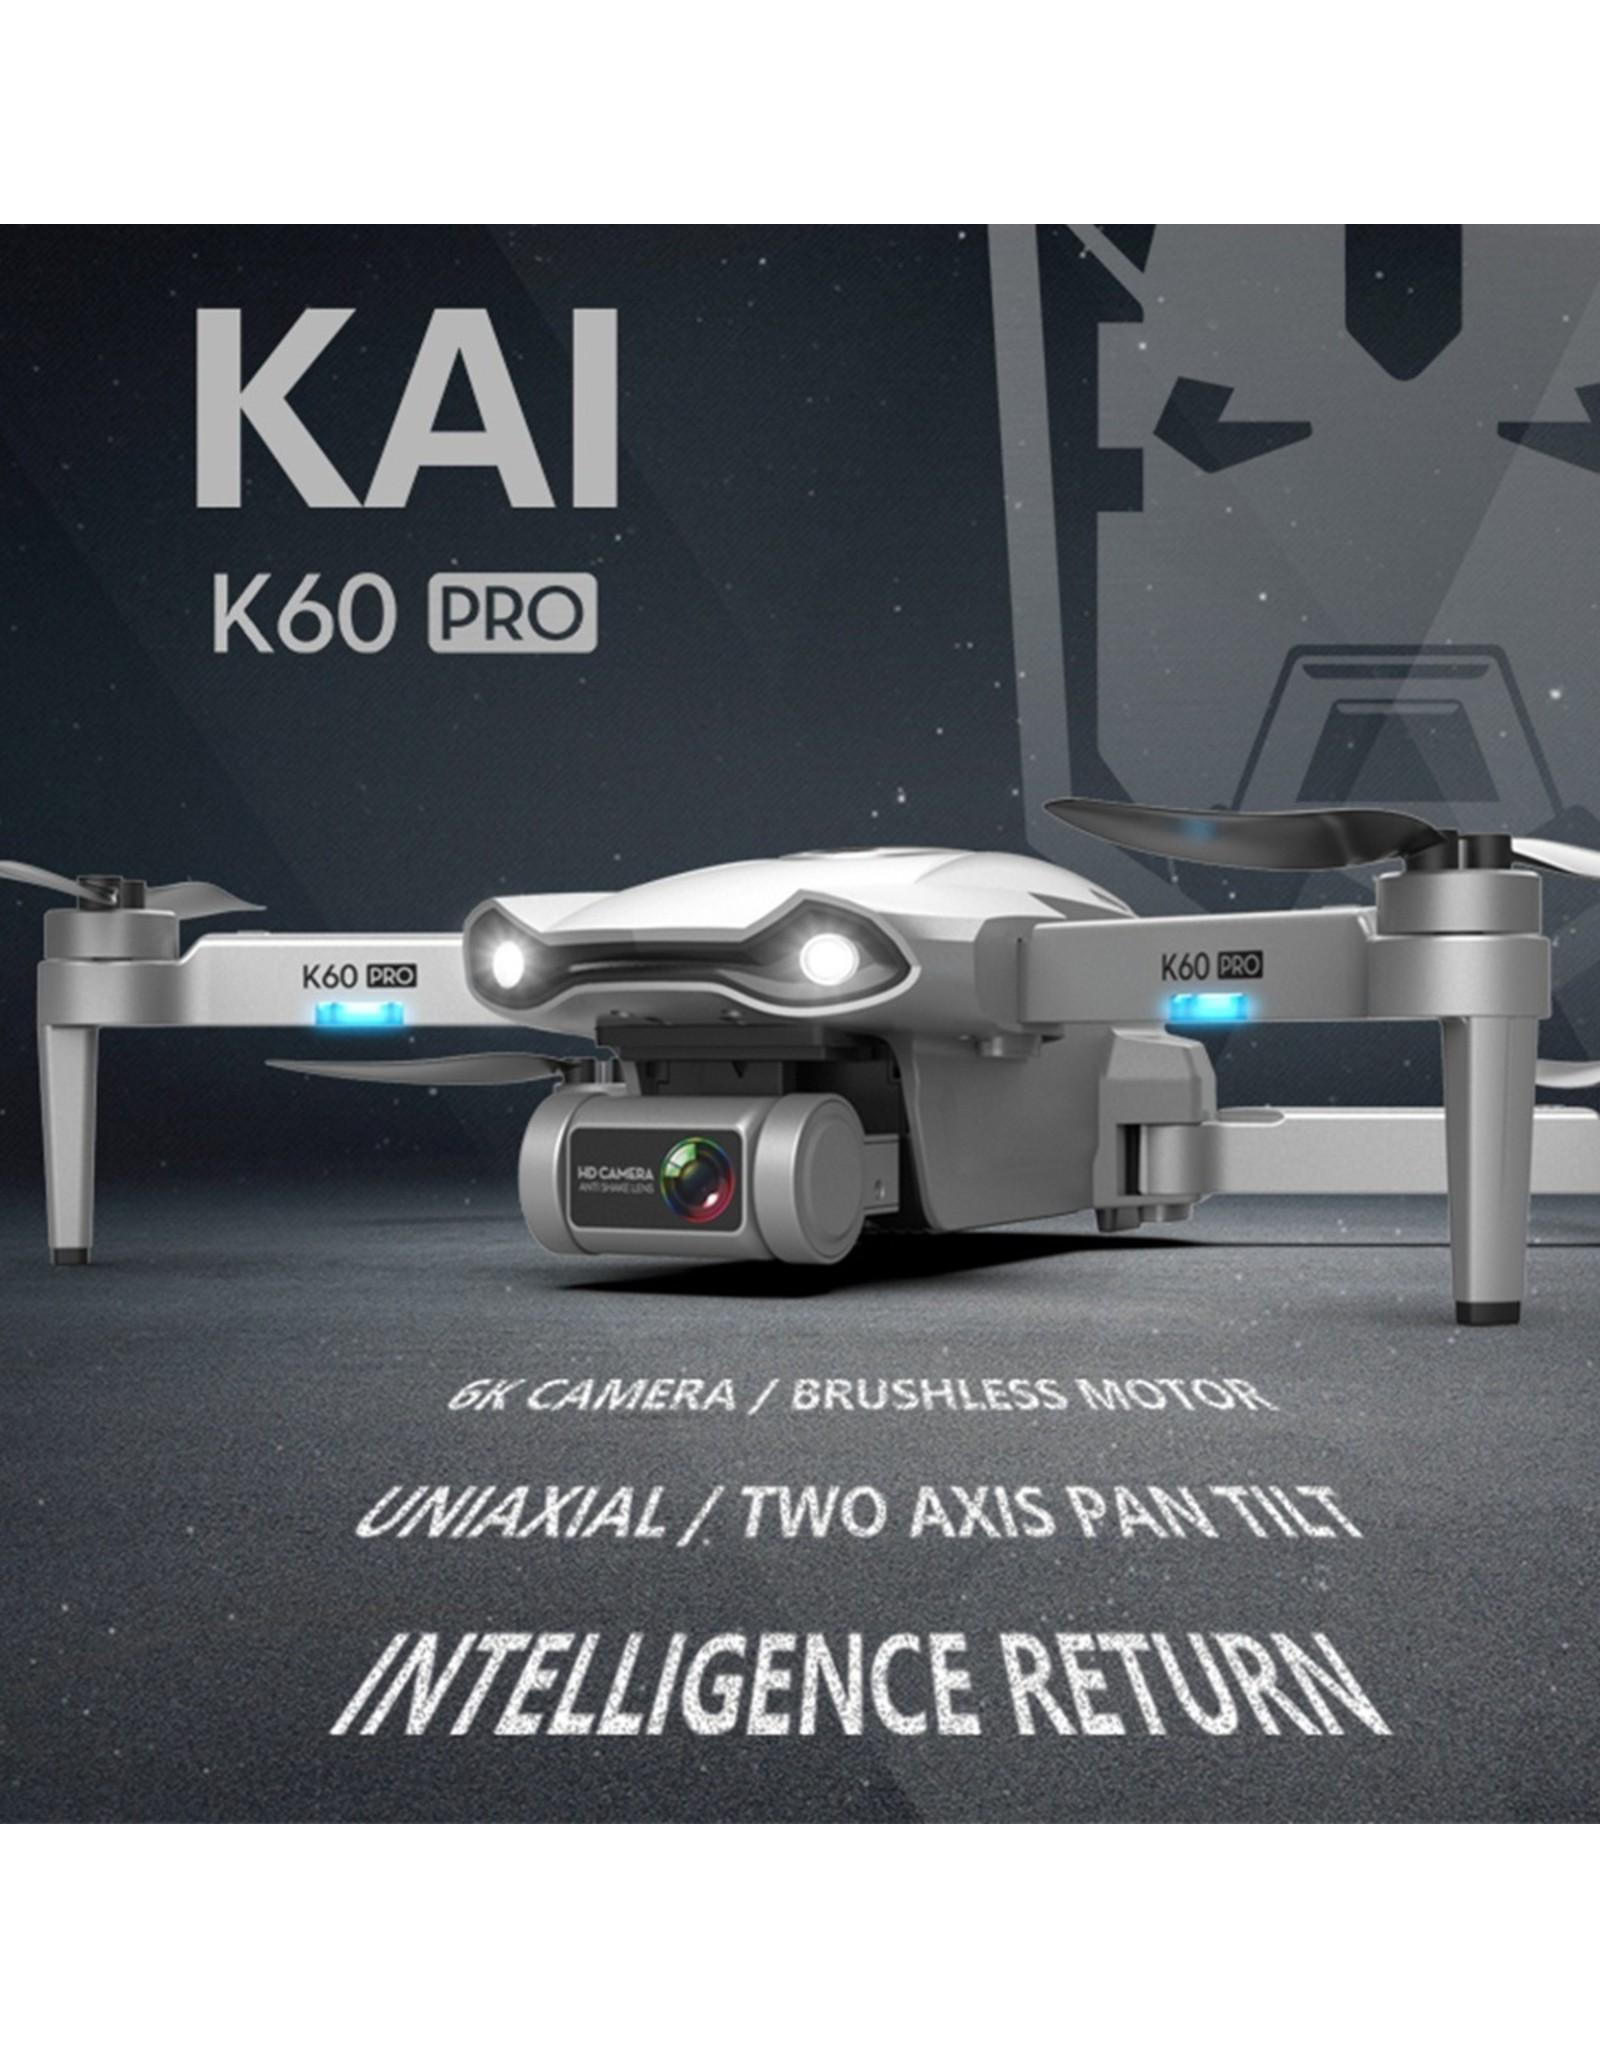 Merkloos Nieuwe K60 Drone 6k HD Dual Camera Tweeassige Gimbal 5G WIFI FPV Opvouwbare RC Quadcopter Vliegen 25 minuten Drone 4k Professionele